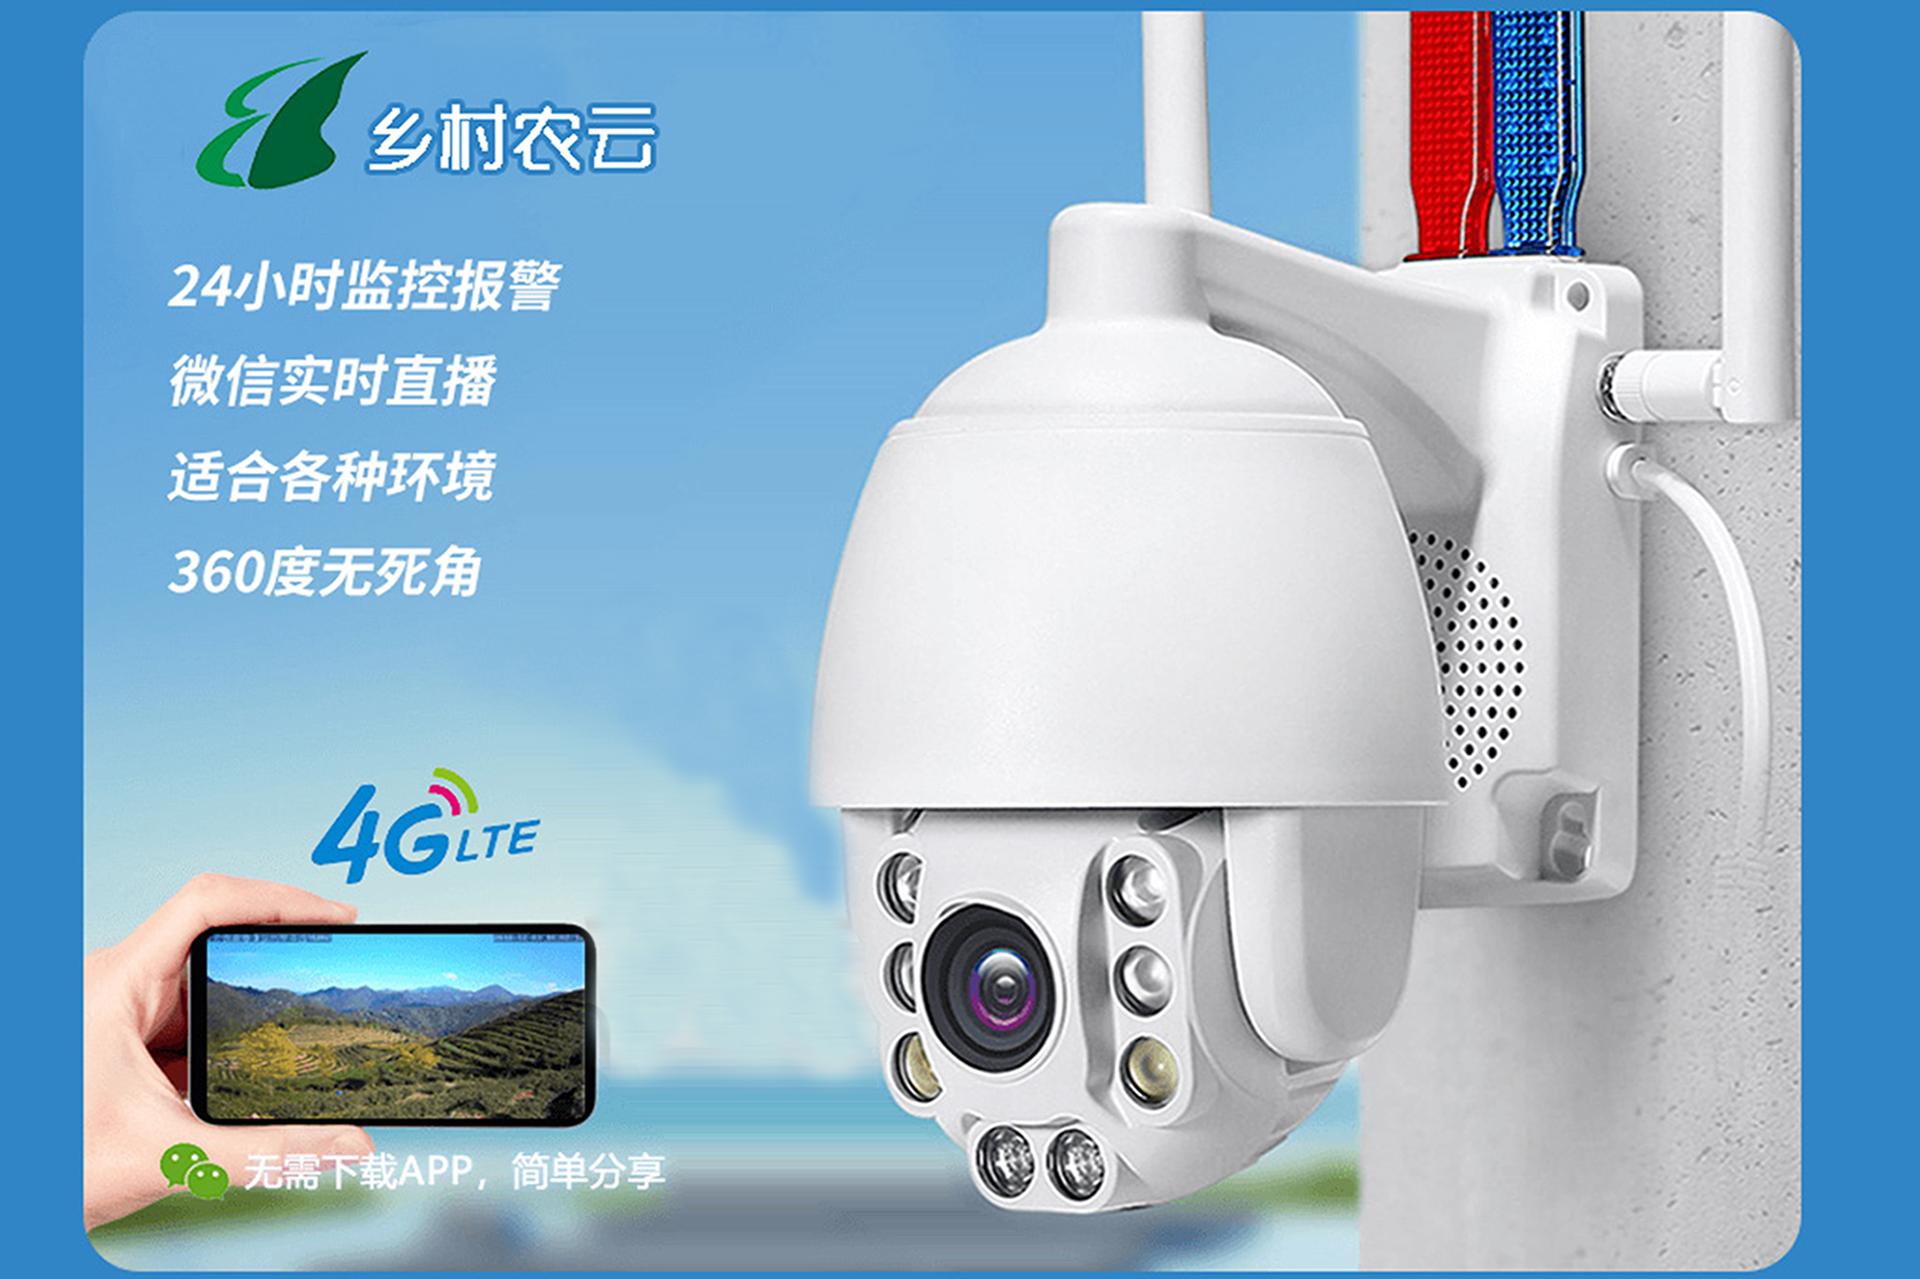 4G监控加喇叭球机